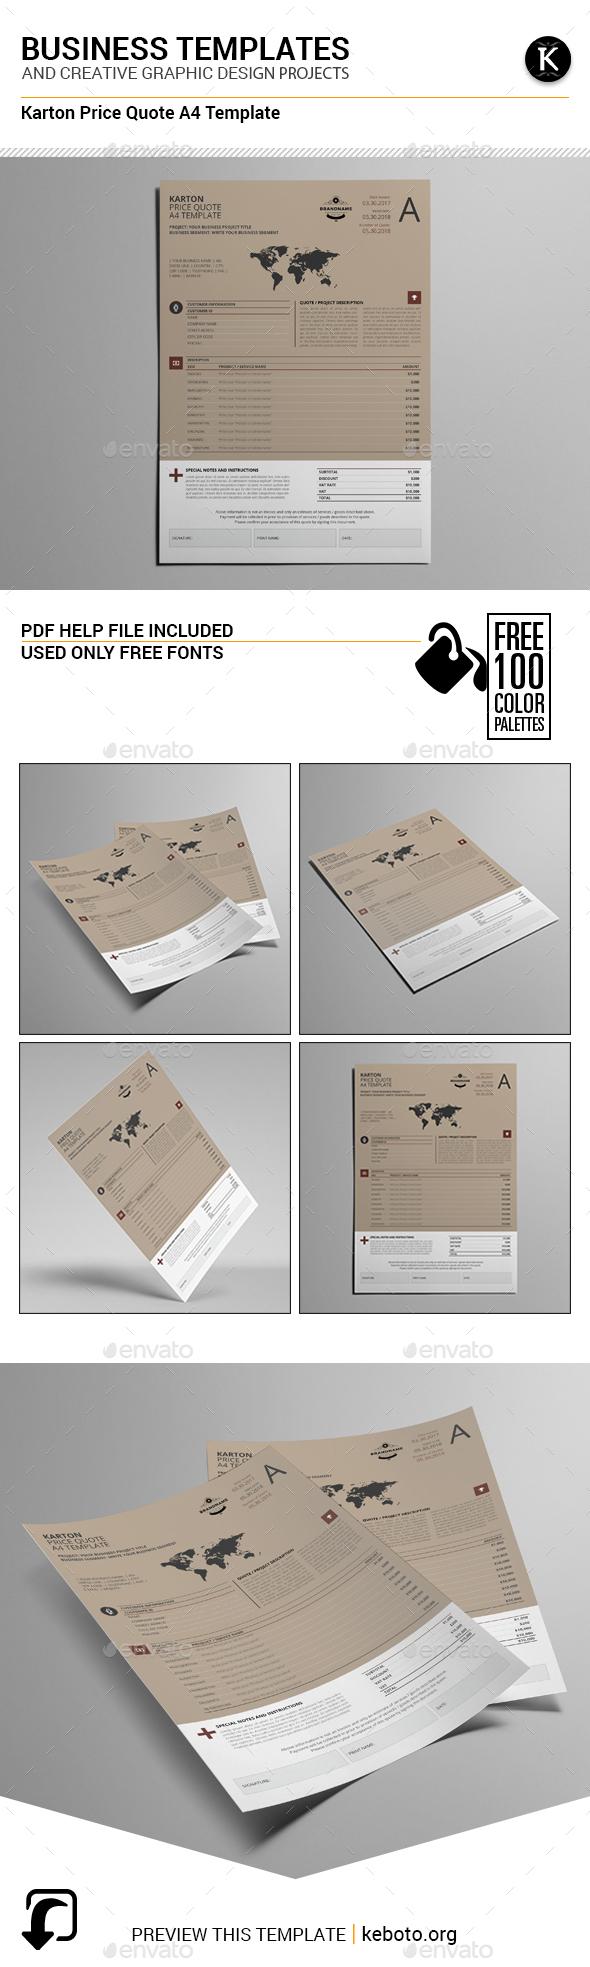 Karton Price Quote A4 Template - Miscellaneous Print Templates